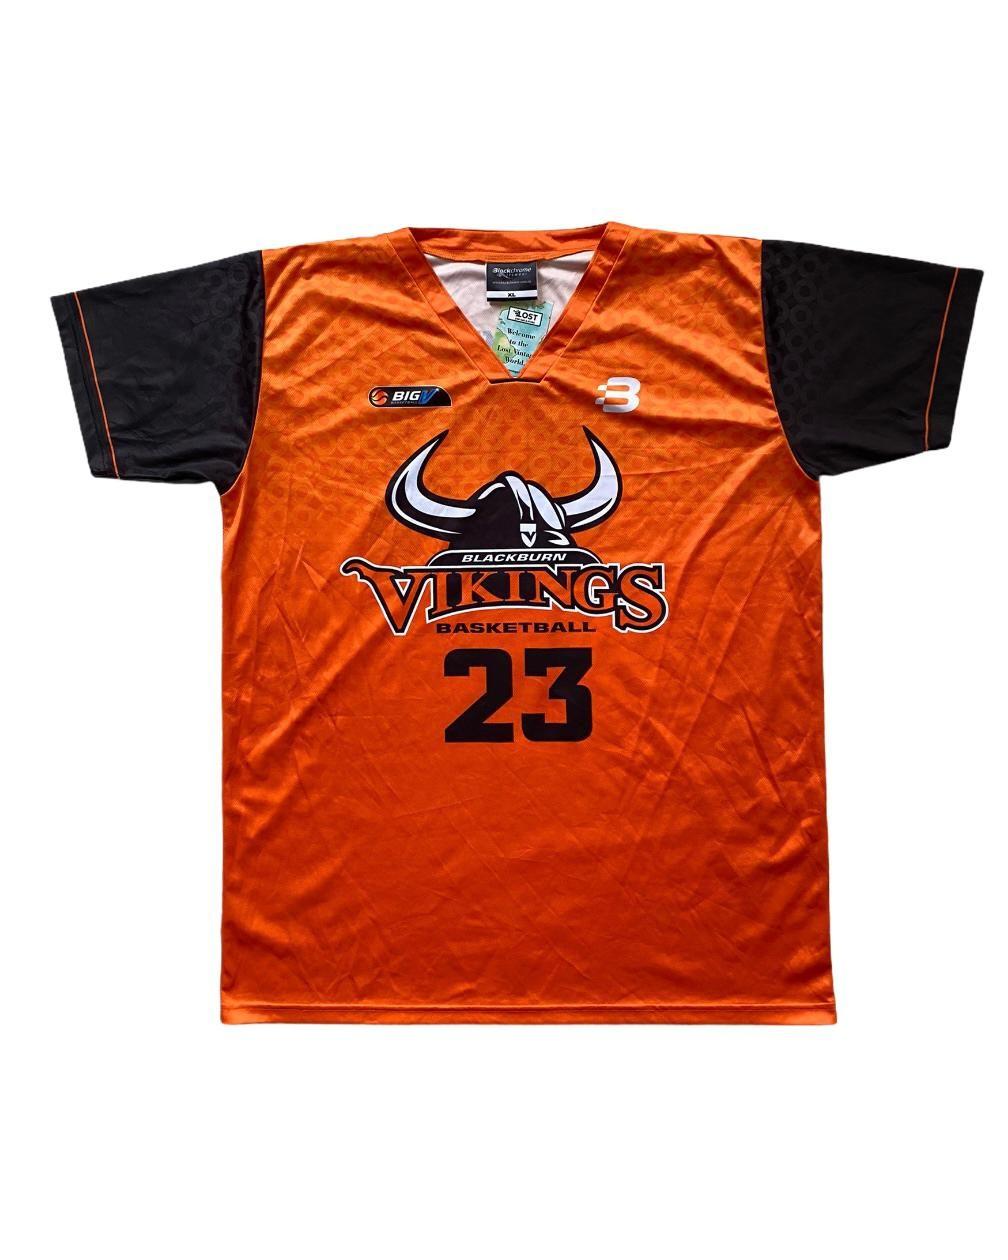 Vikings Basketball T Shirt (XL)